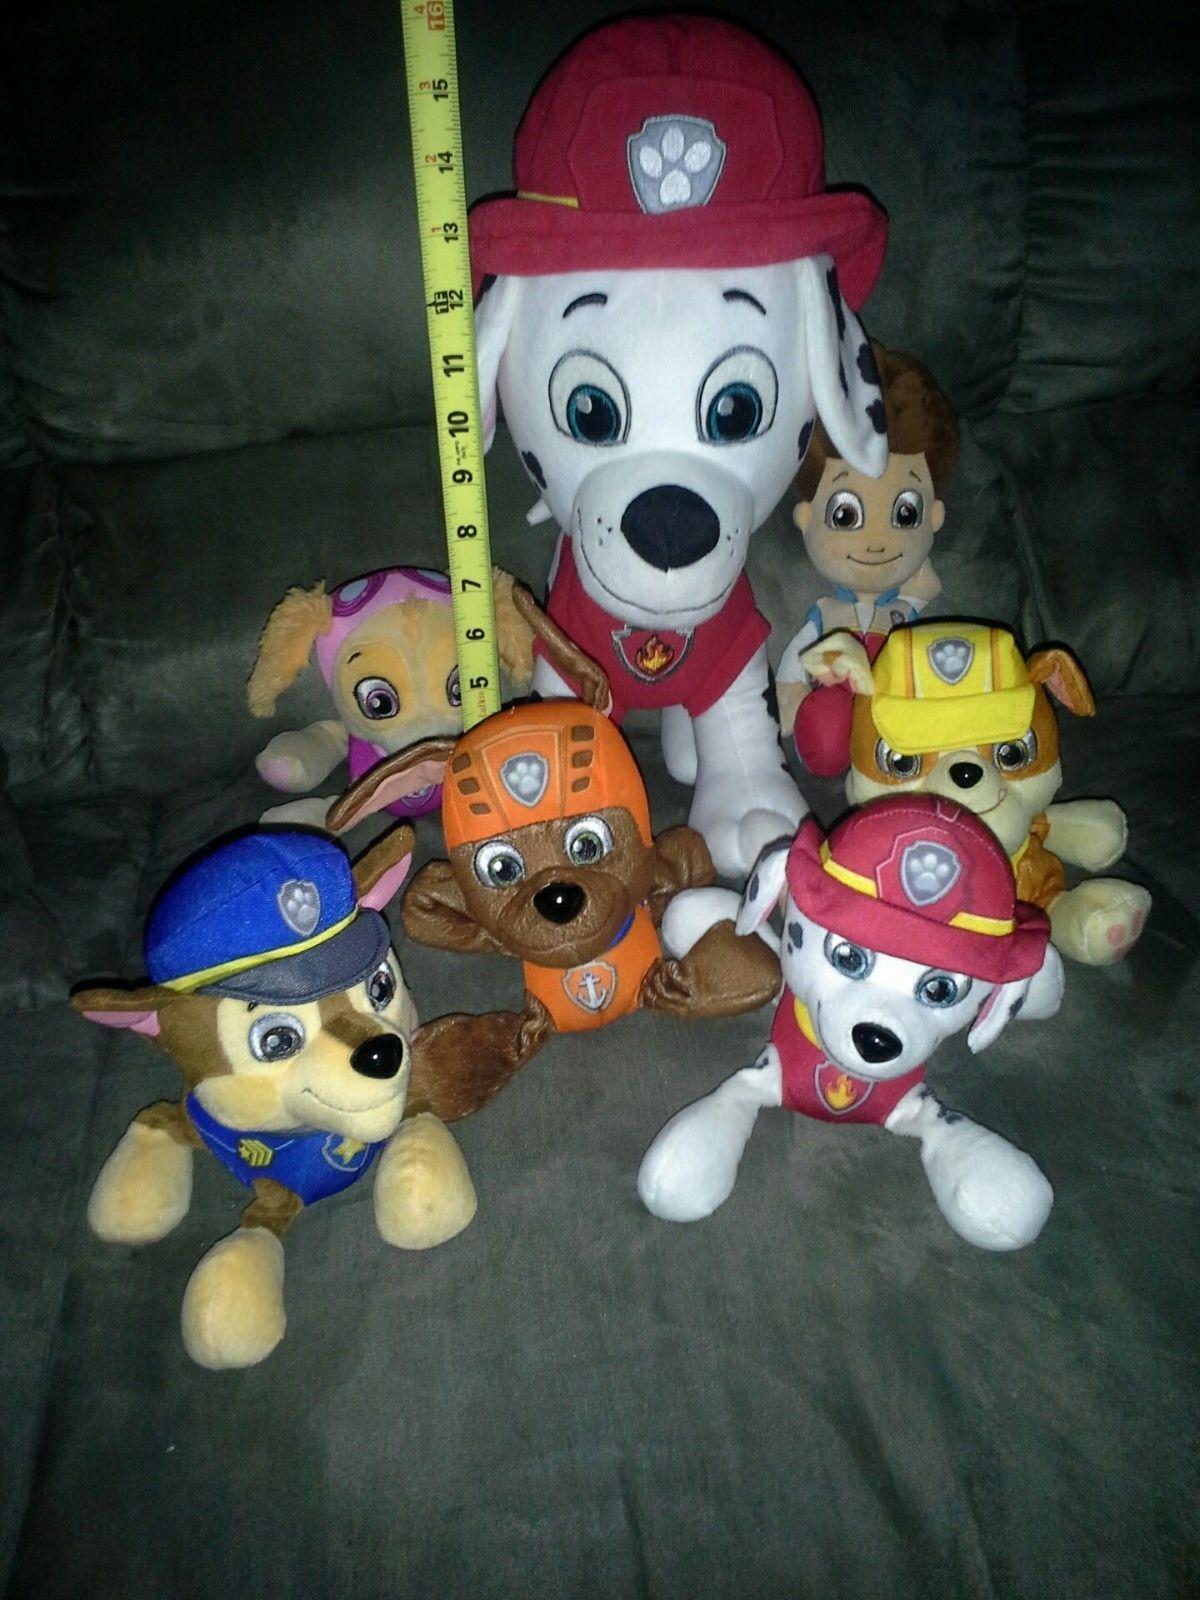 39 99 7 Paw Patrol Stuffed Animals Incl 16 Marshall Toy Plush